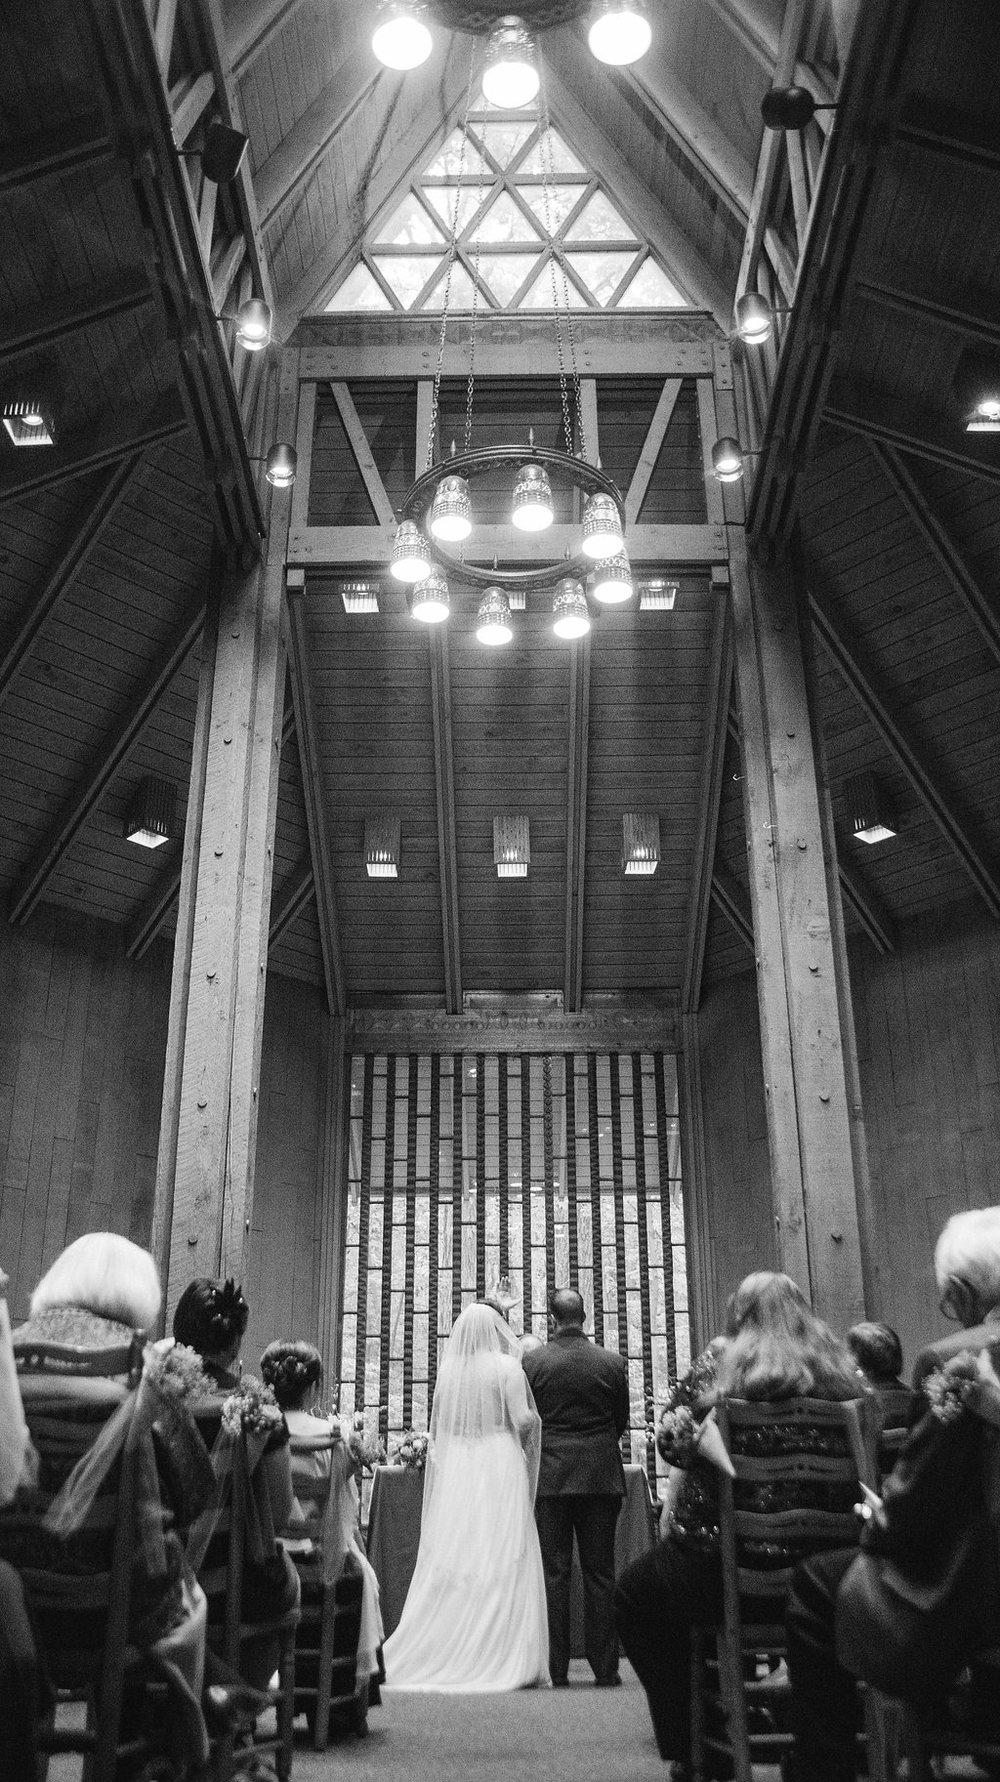 wilson-chapel-skidmore-college-saratoga-springs-wedding